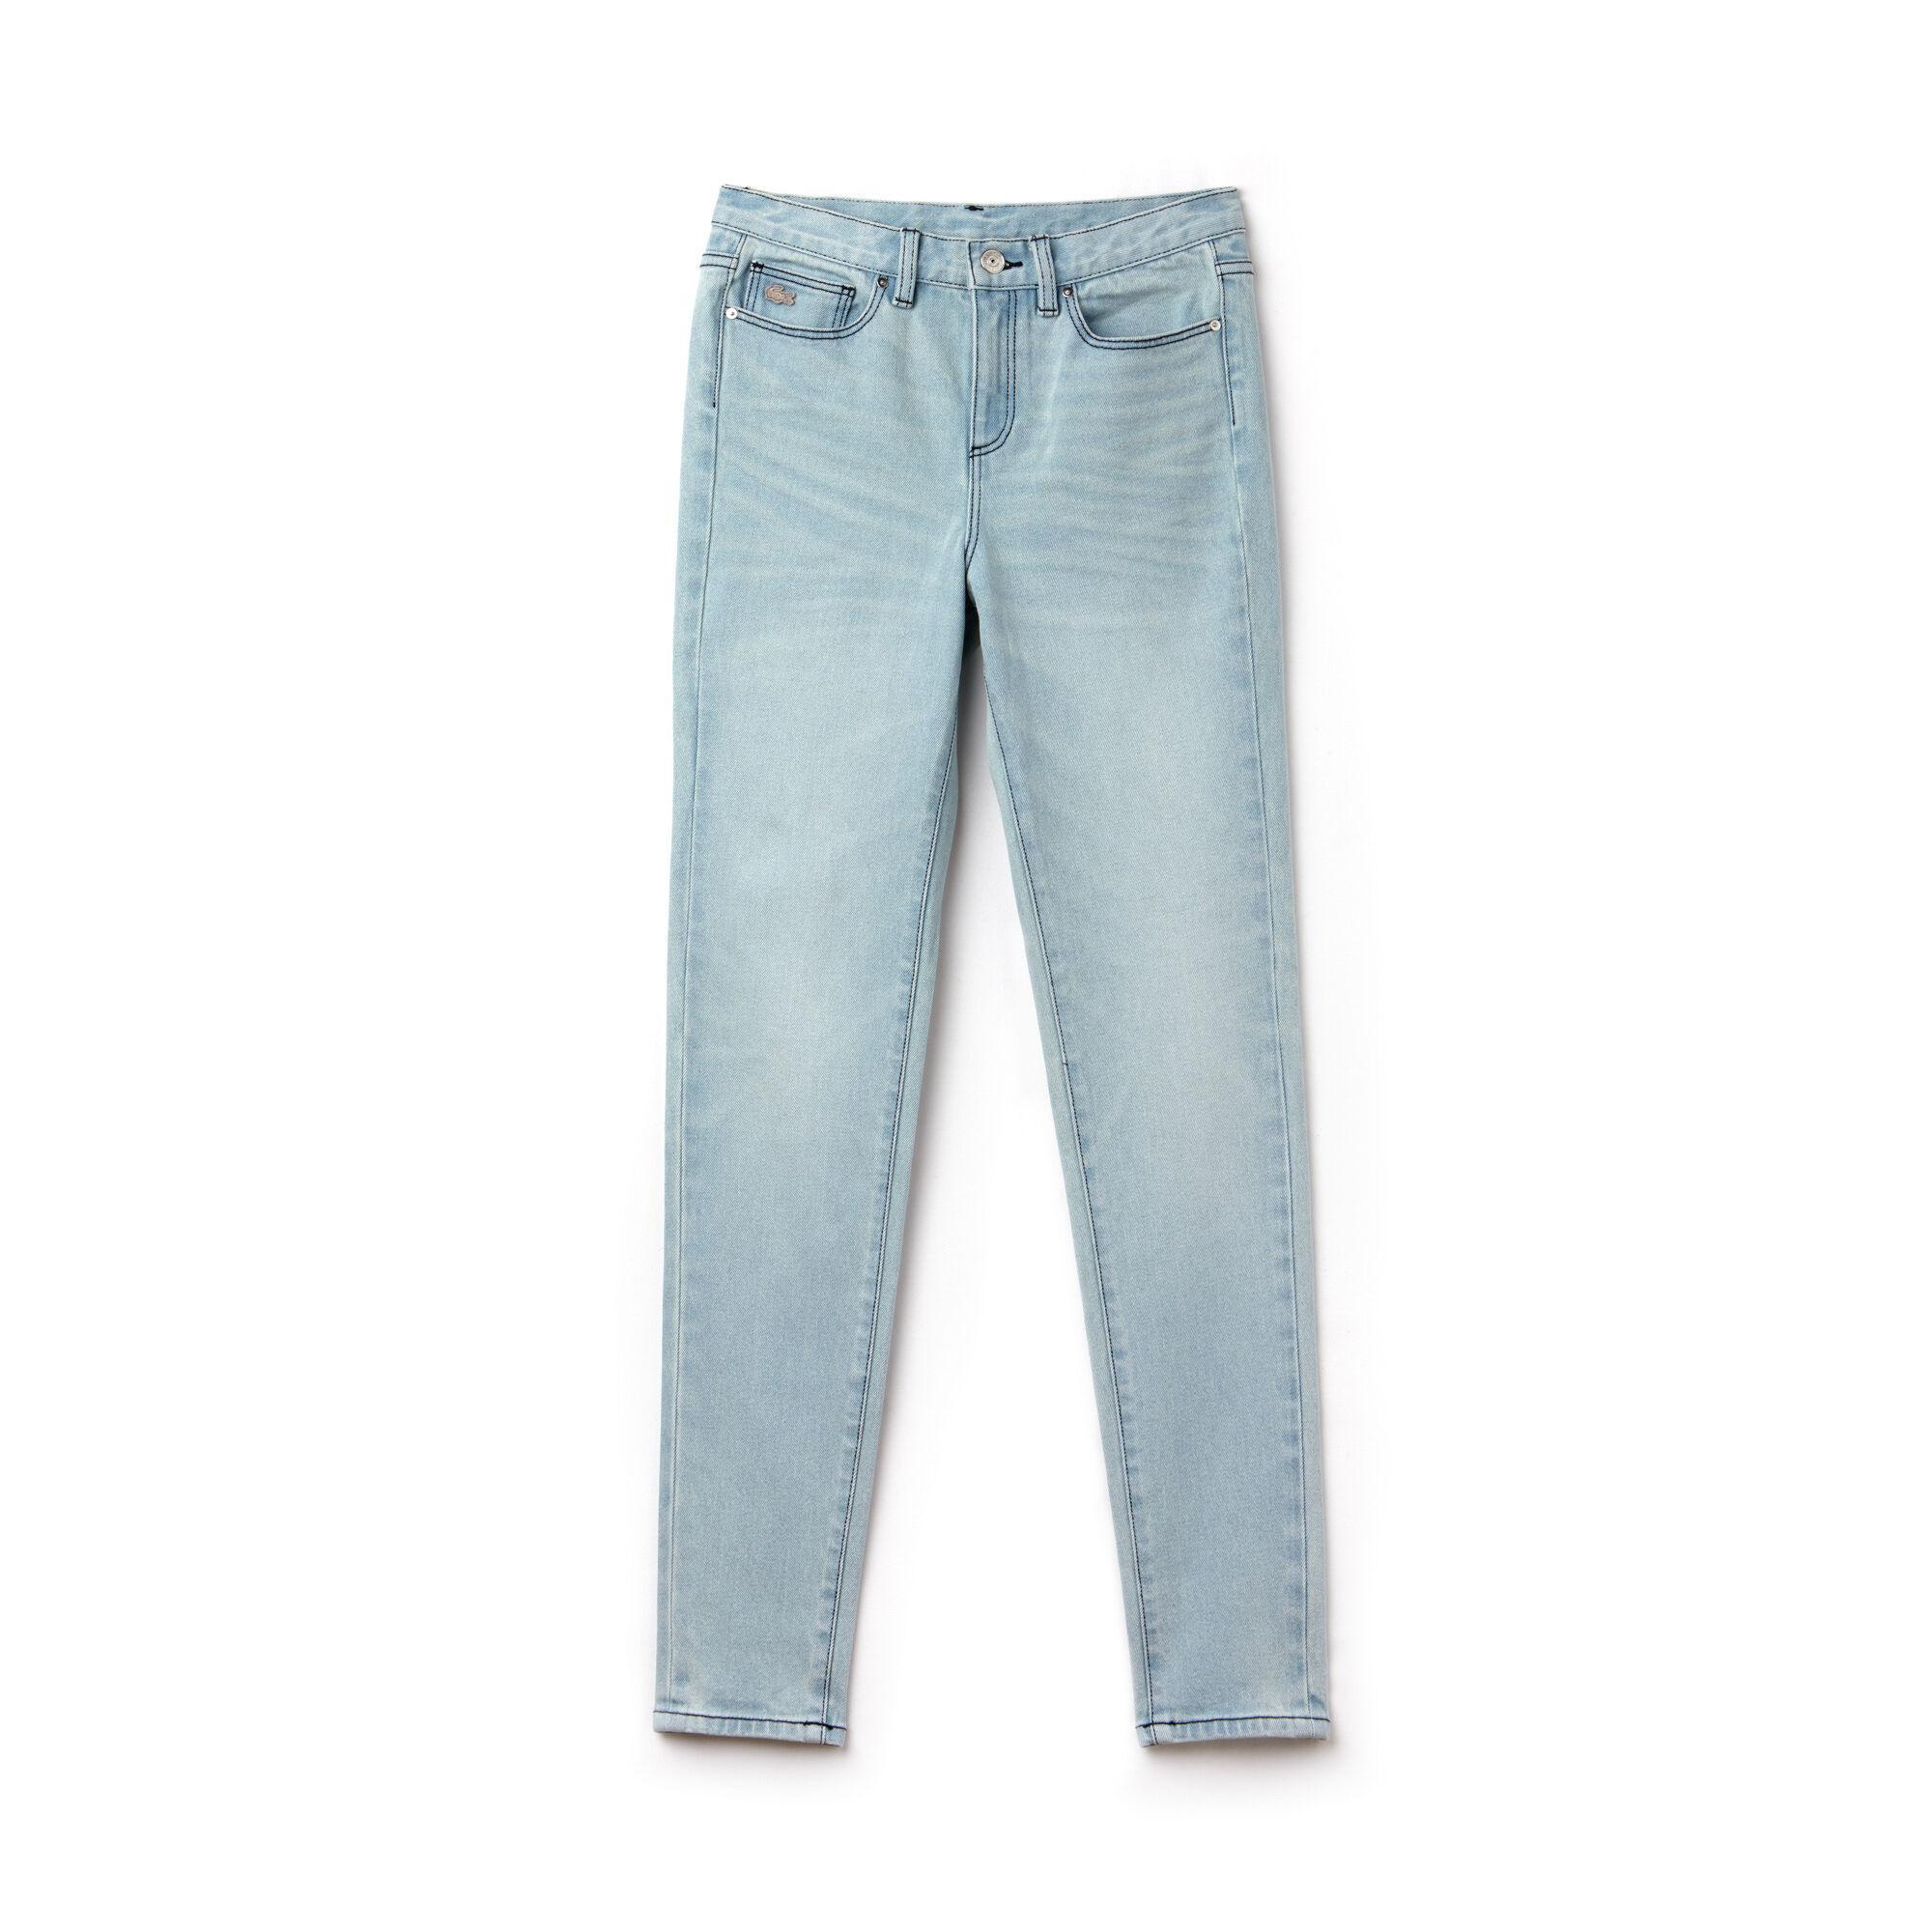 Lacoste L!VE Women's Stretch Denim Jeans